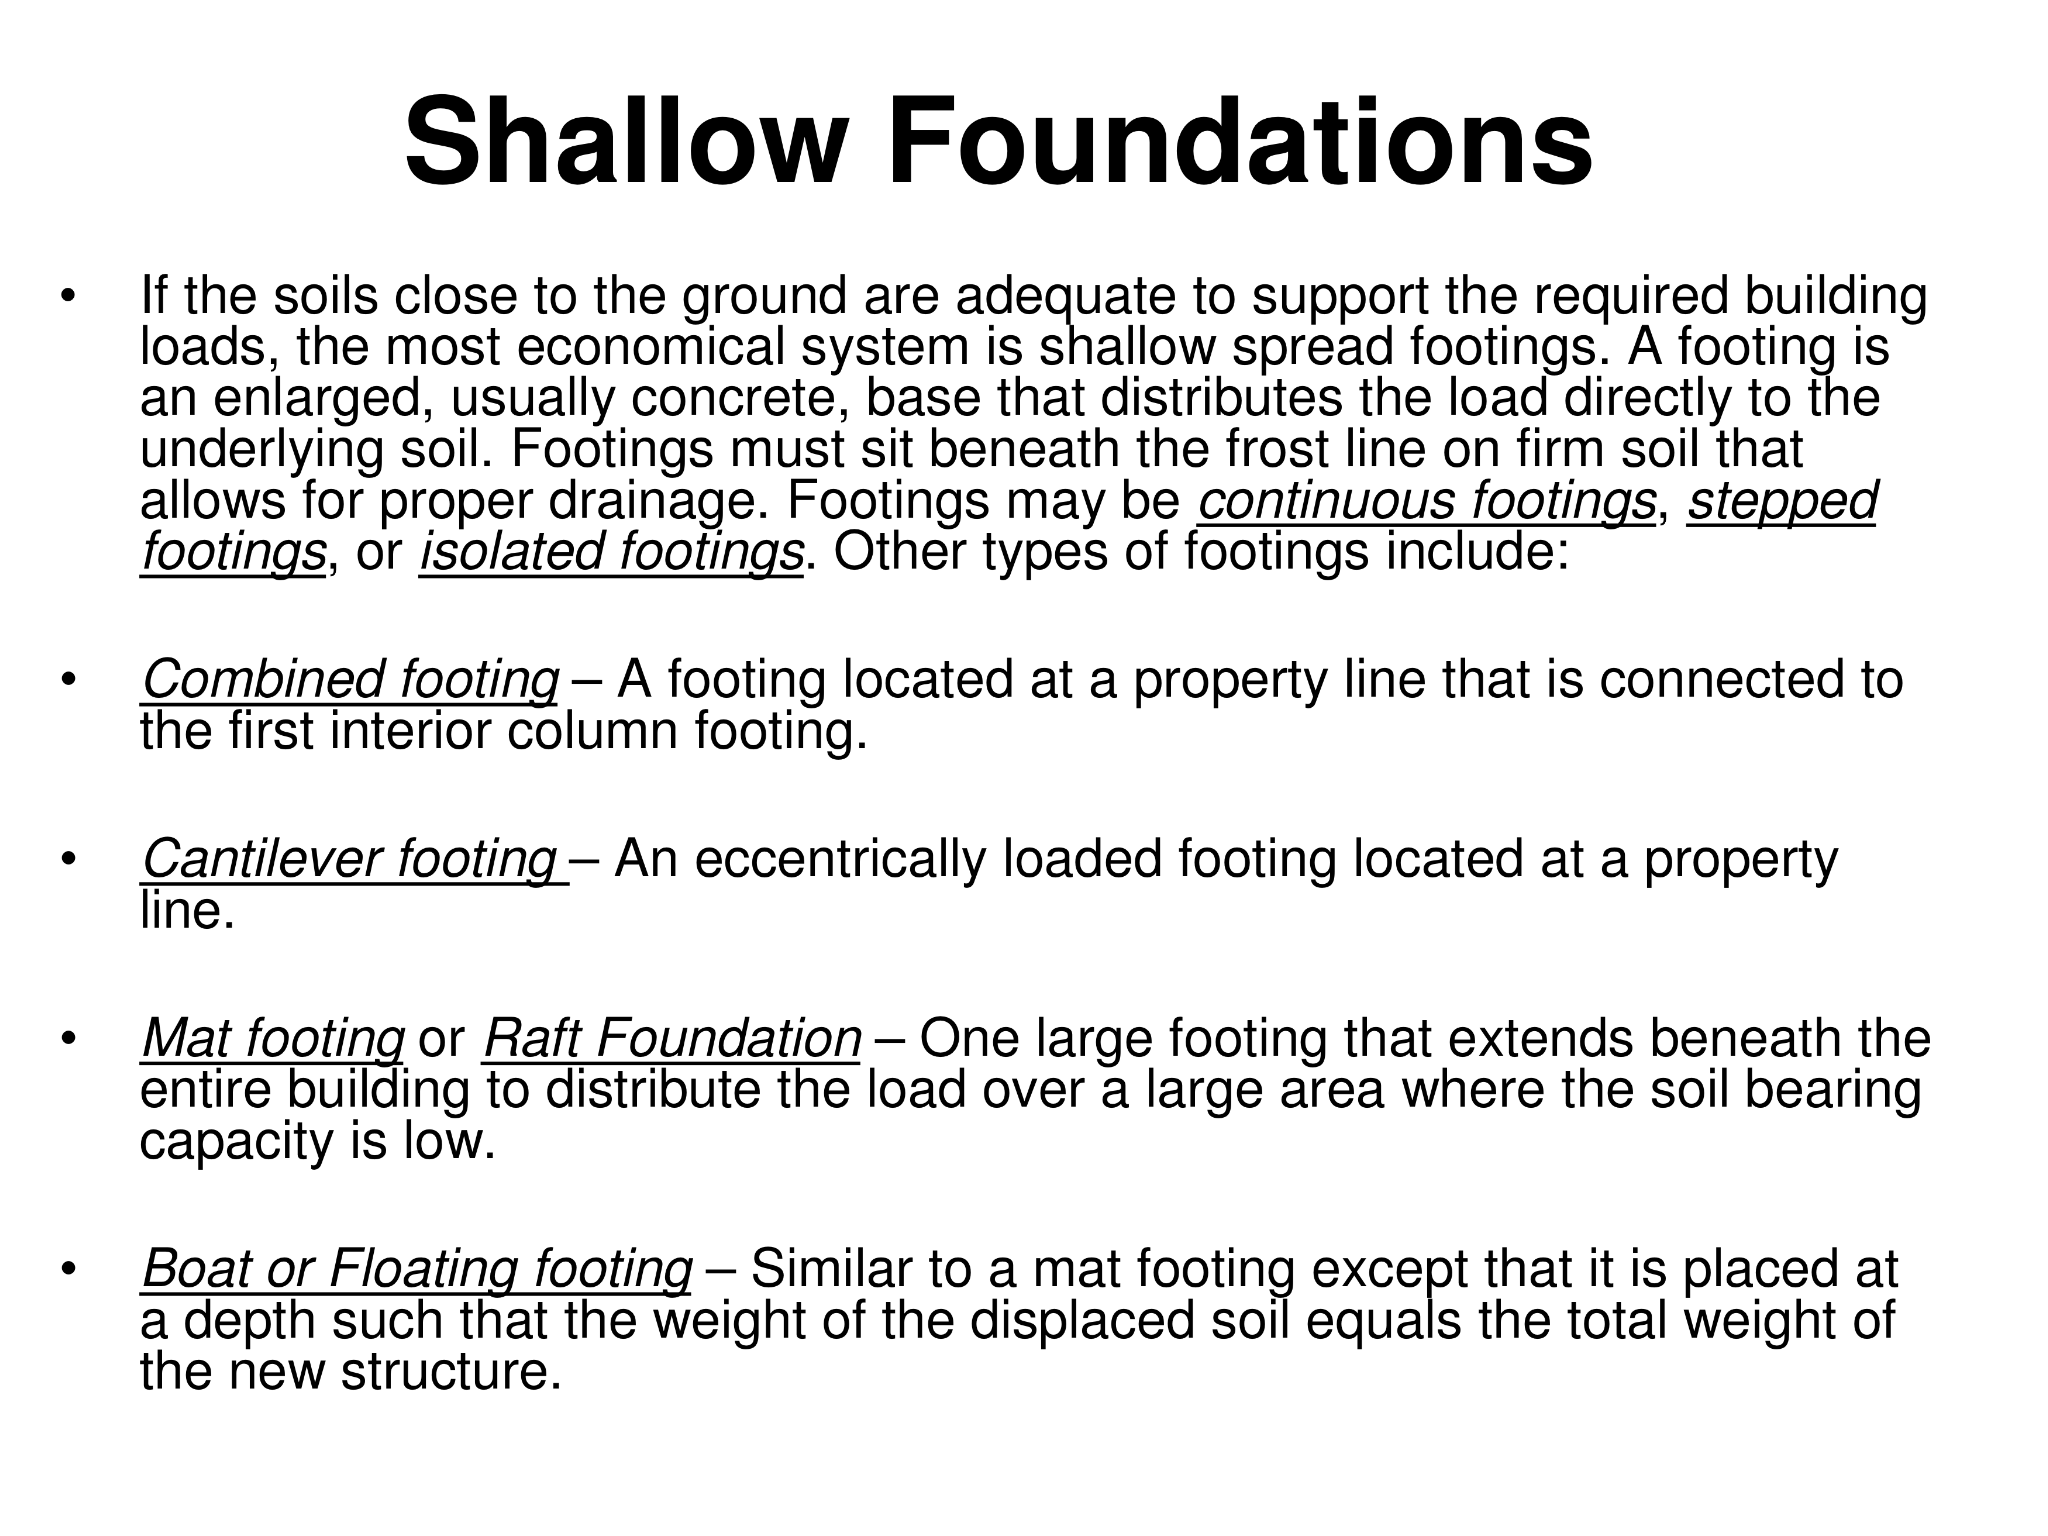 Shallow foundations (Mat/ Raft vs  Boat/ Float) | Soils and